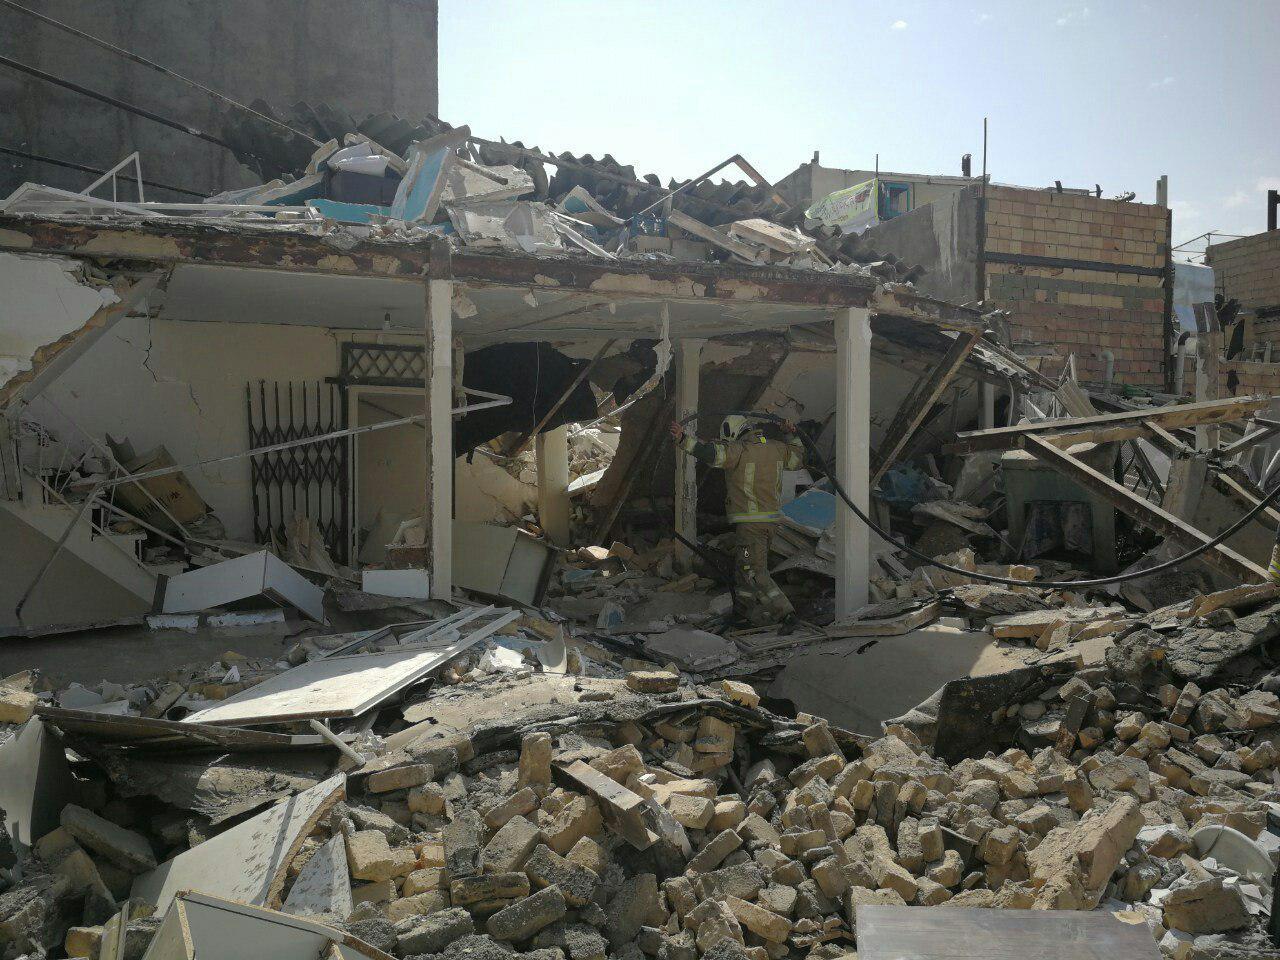 انفجار در تهرانپارس 5 کشته و زخمی بر جا گذاشت + عکس